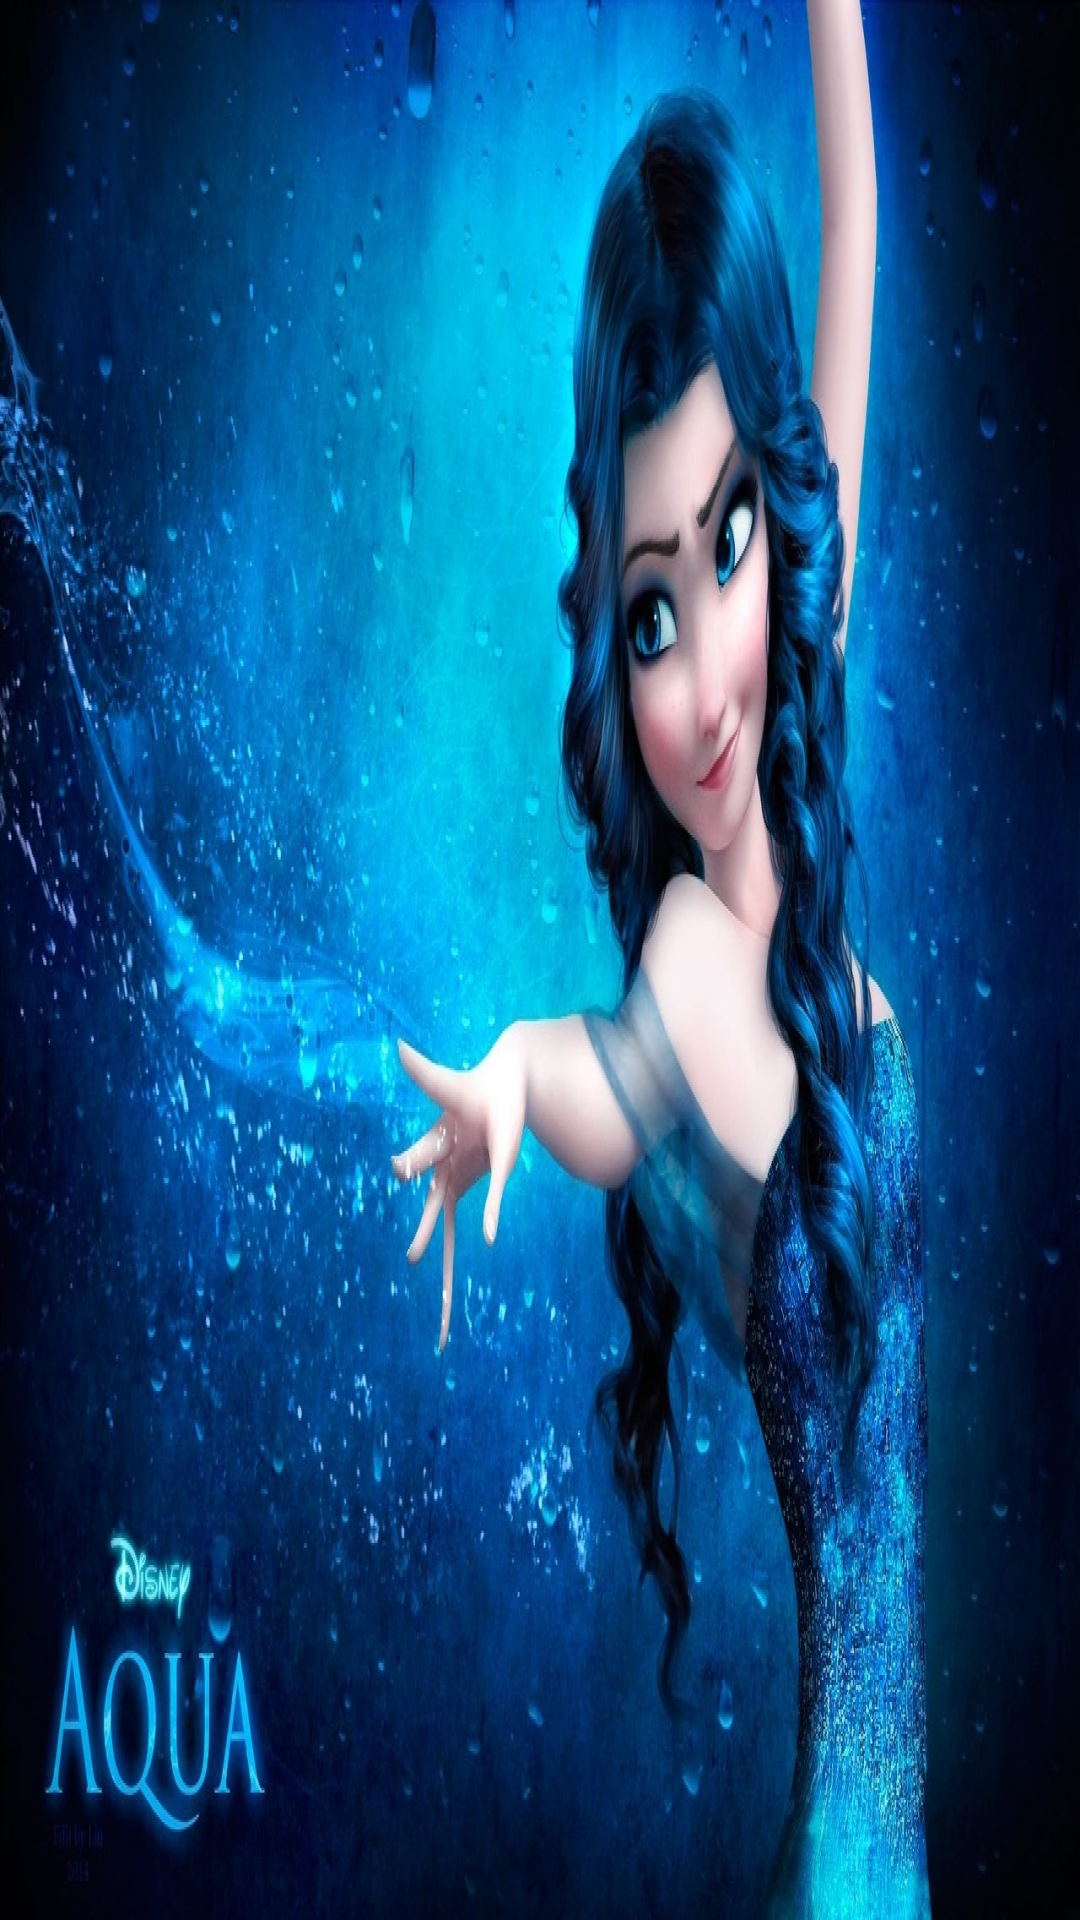 Disney princess aqua hd wallpaper tablet and mobile devices altavistaventures Choice Image